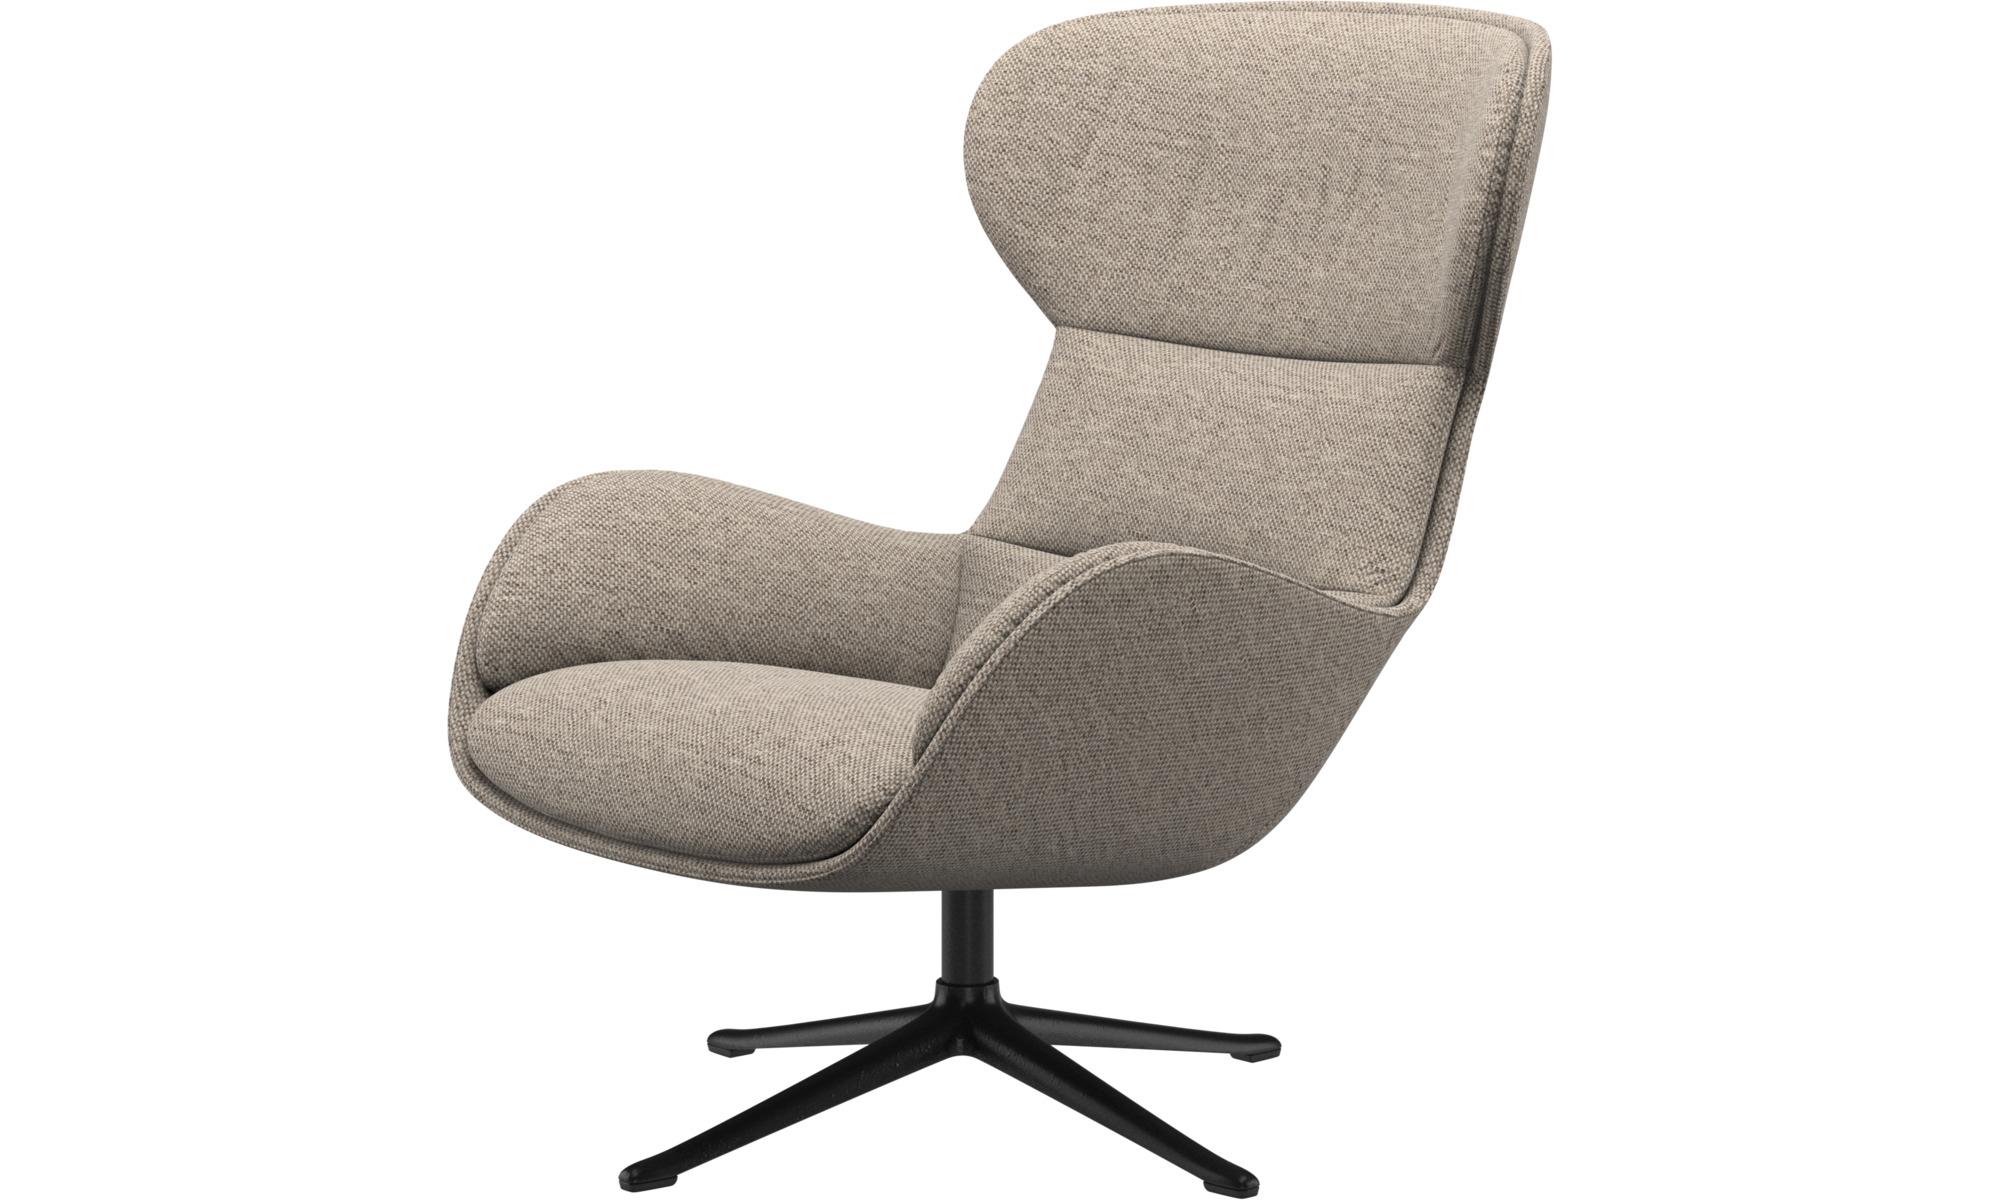 Sessel - Reno Sessel mit Drehfunktion - Beige - Stoff